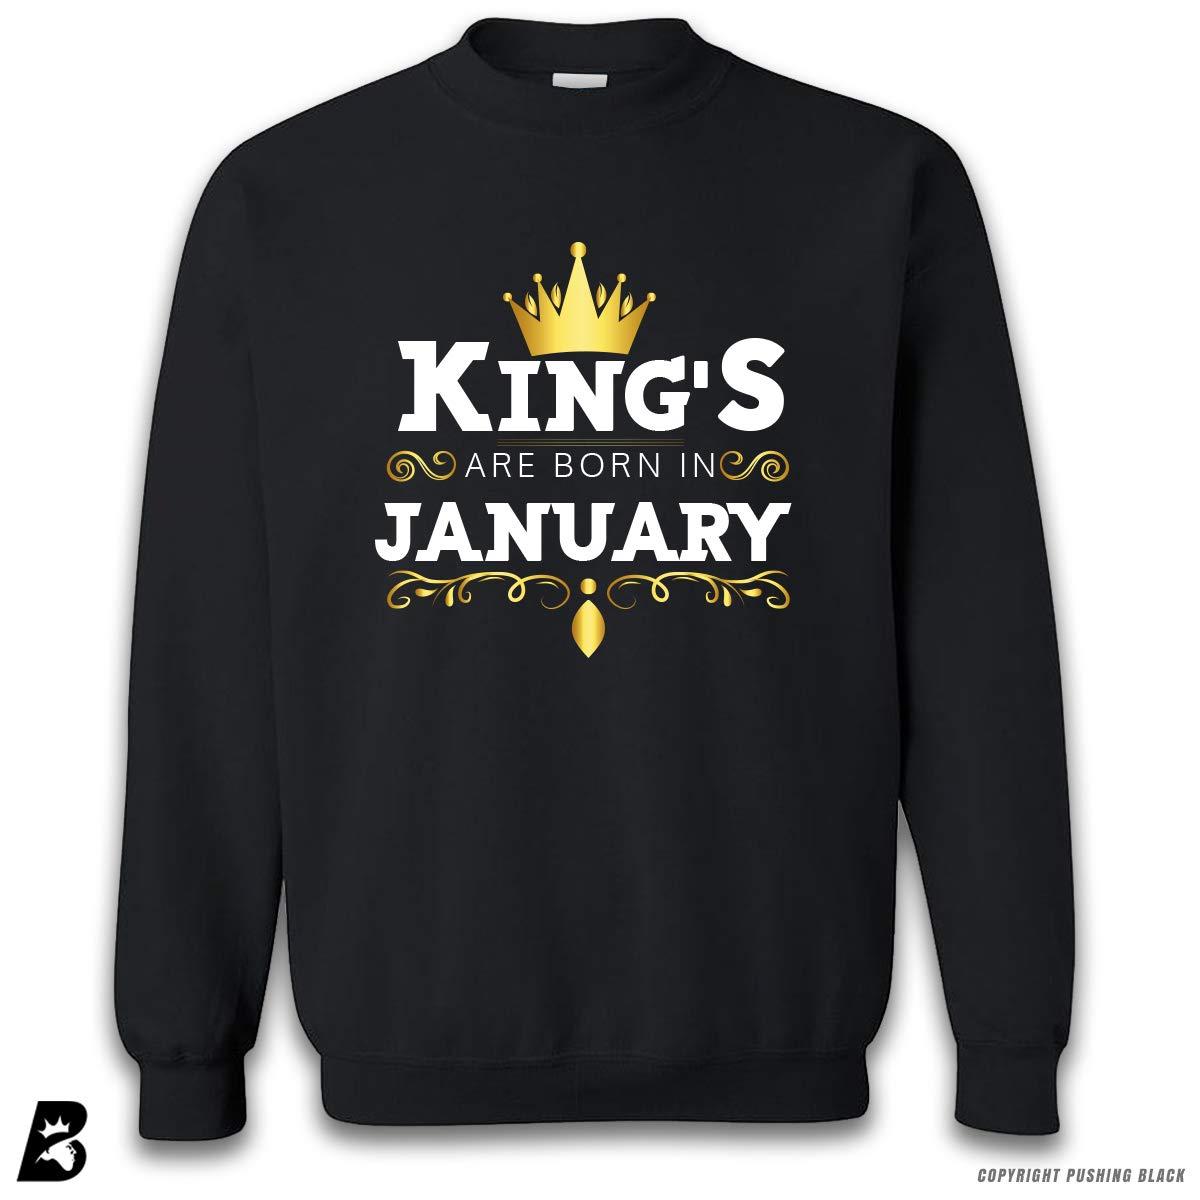 Kings are Born in January Premium Unisex Sweatshirt